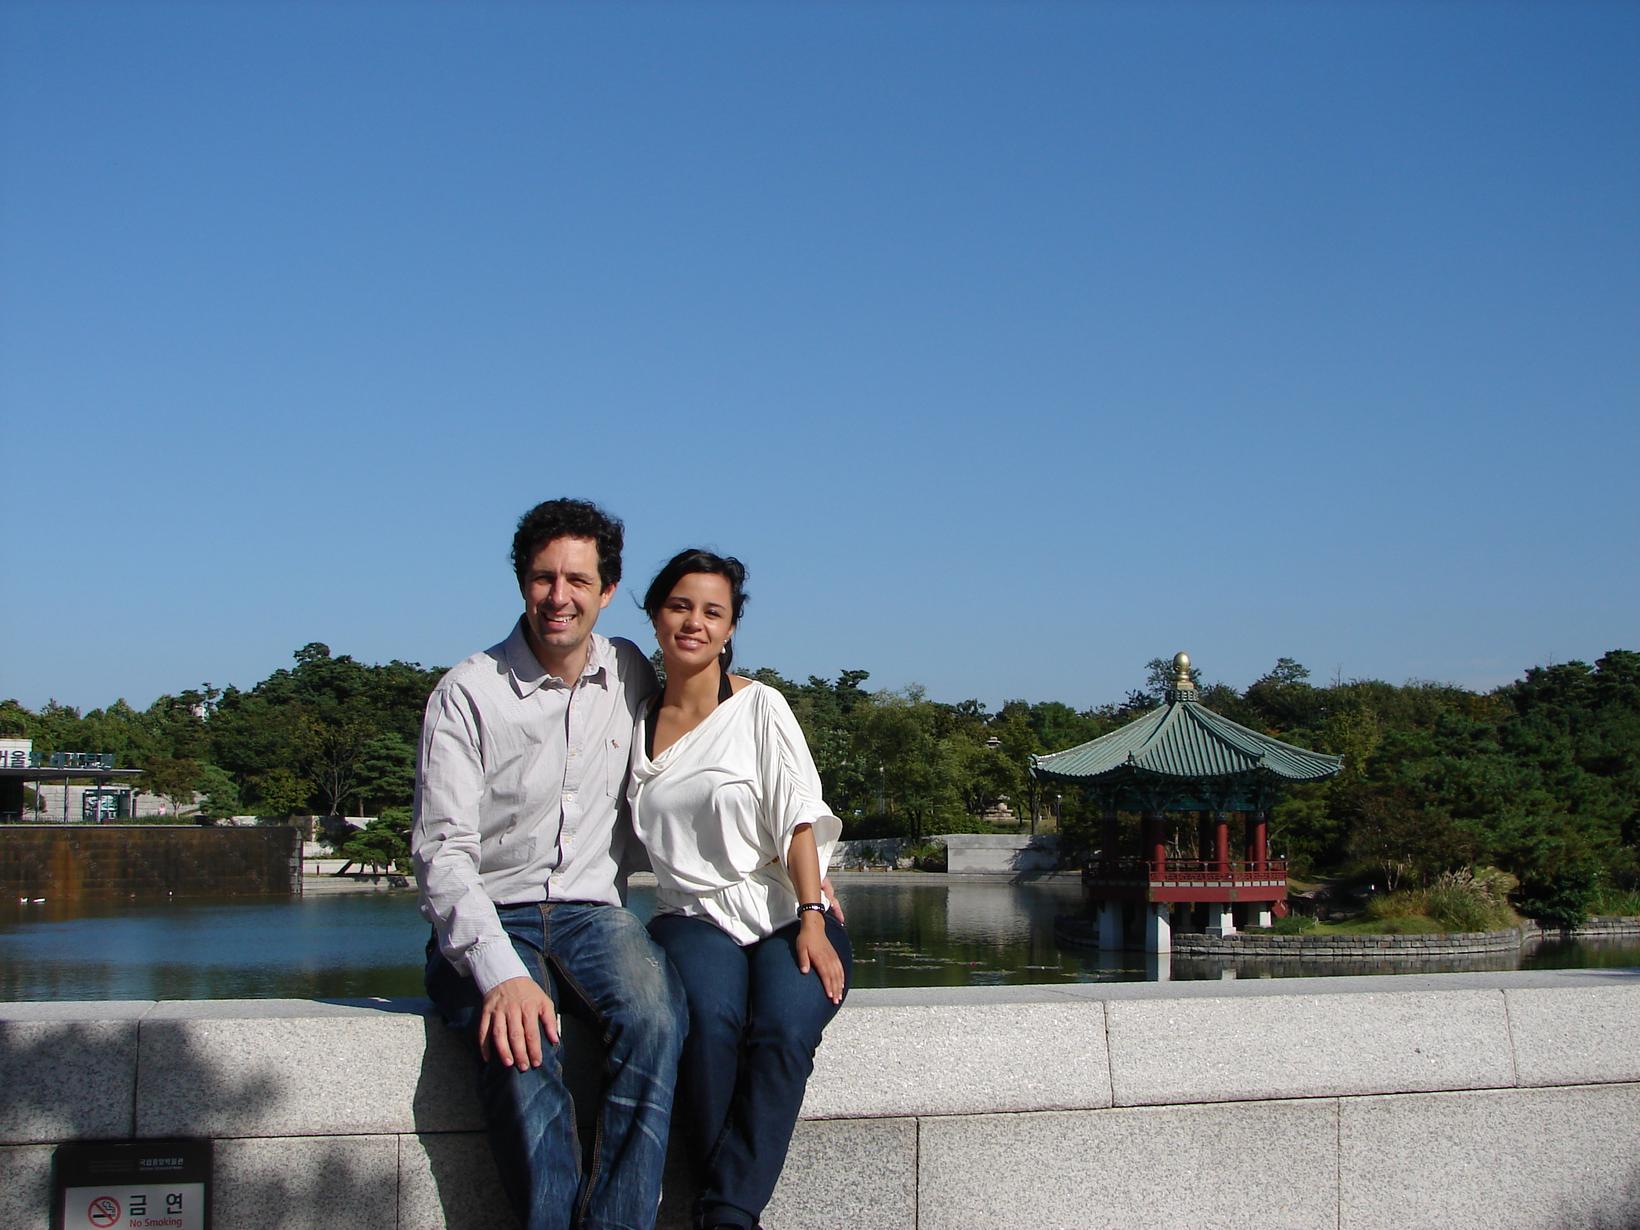 Benjamin & Natalia from Washington, D.C., Washington, D.C., United States